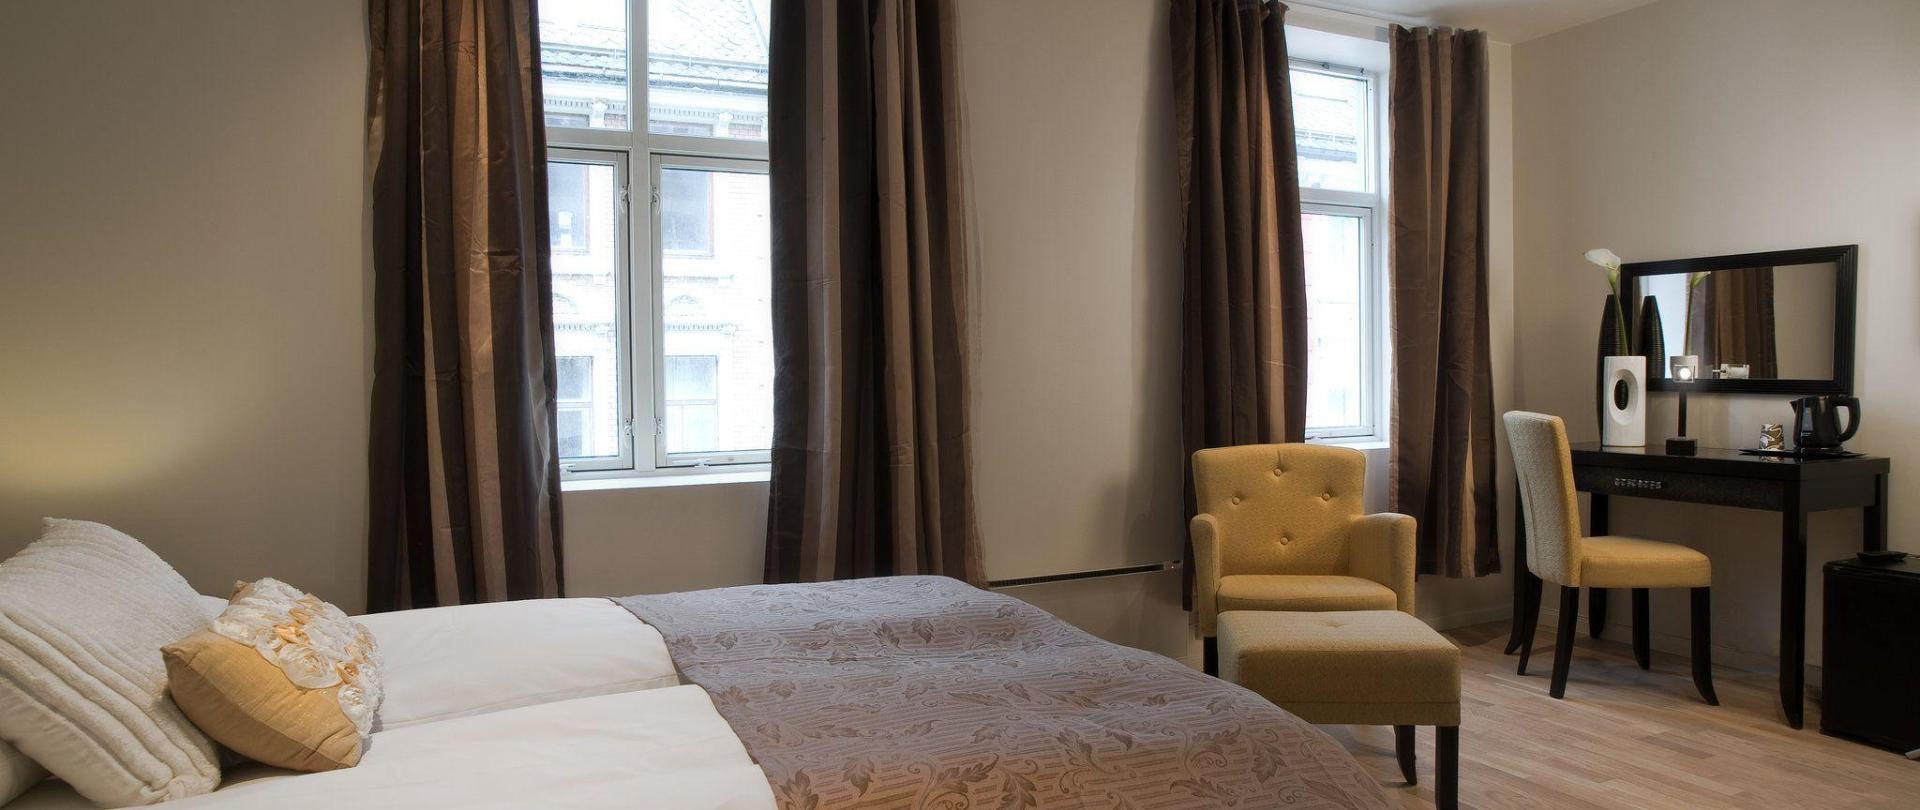 basic-hotel-bergen-006-2.jpg